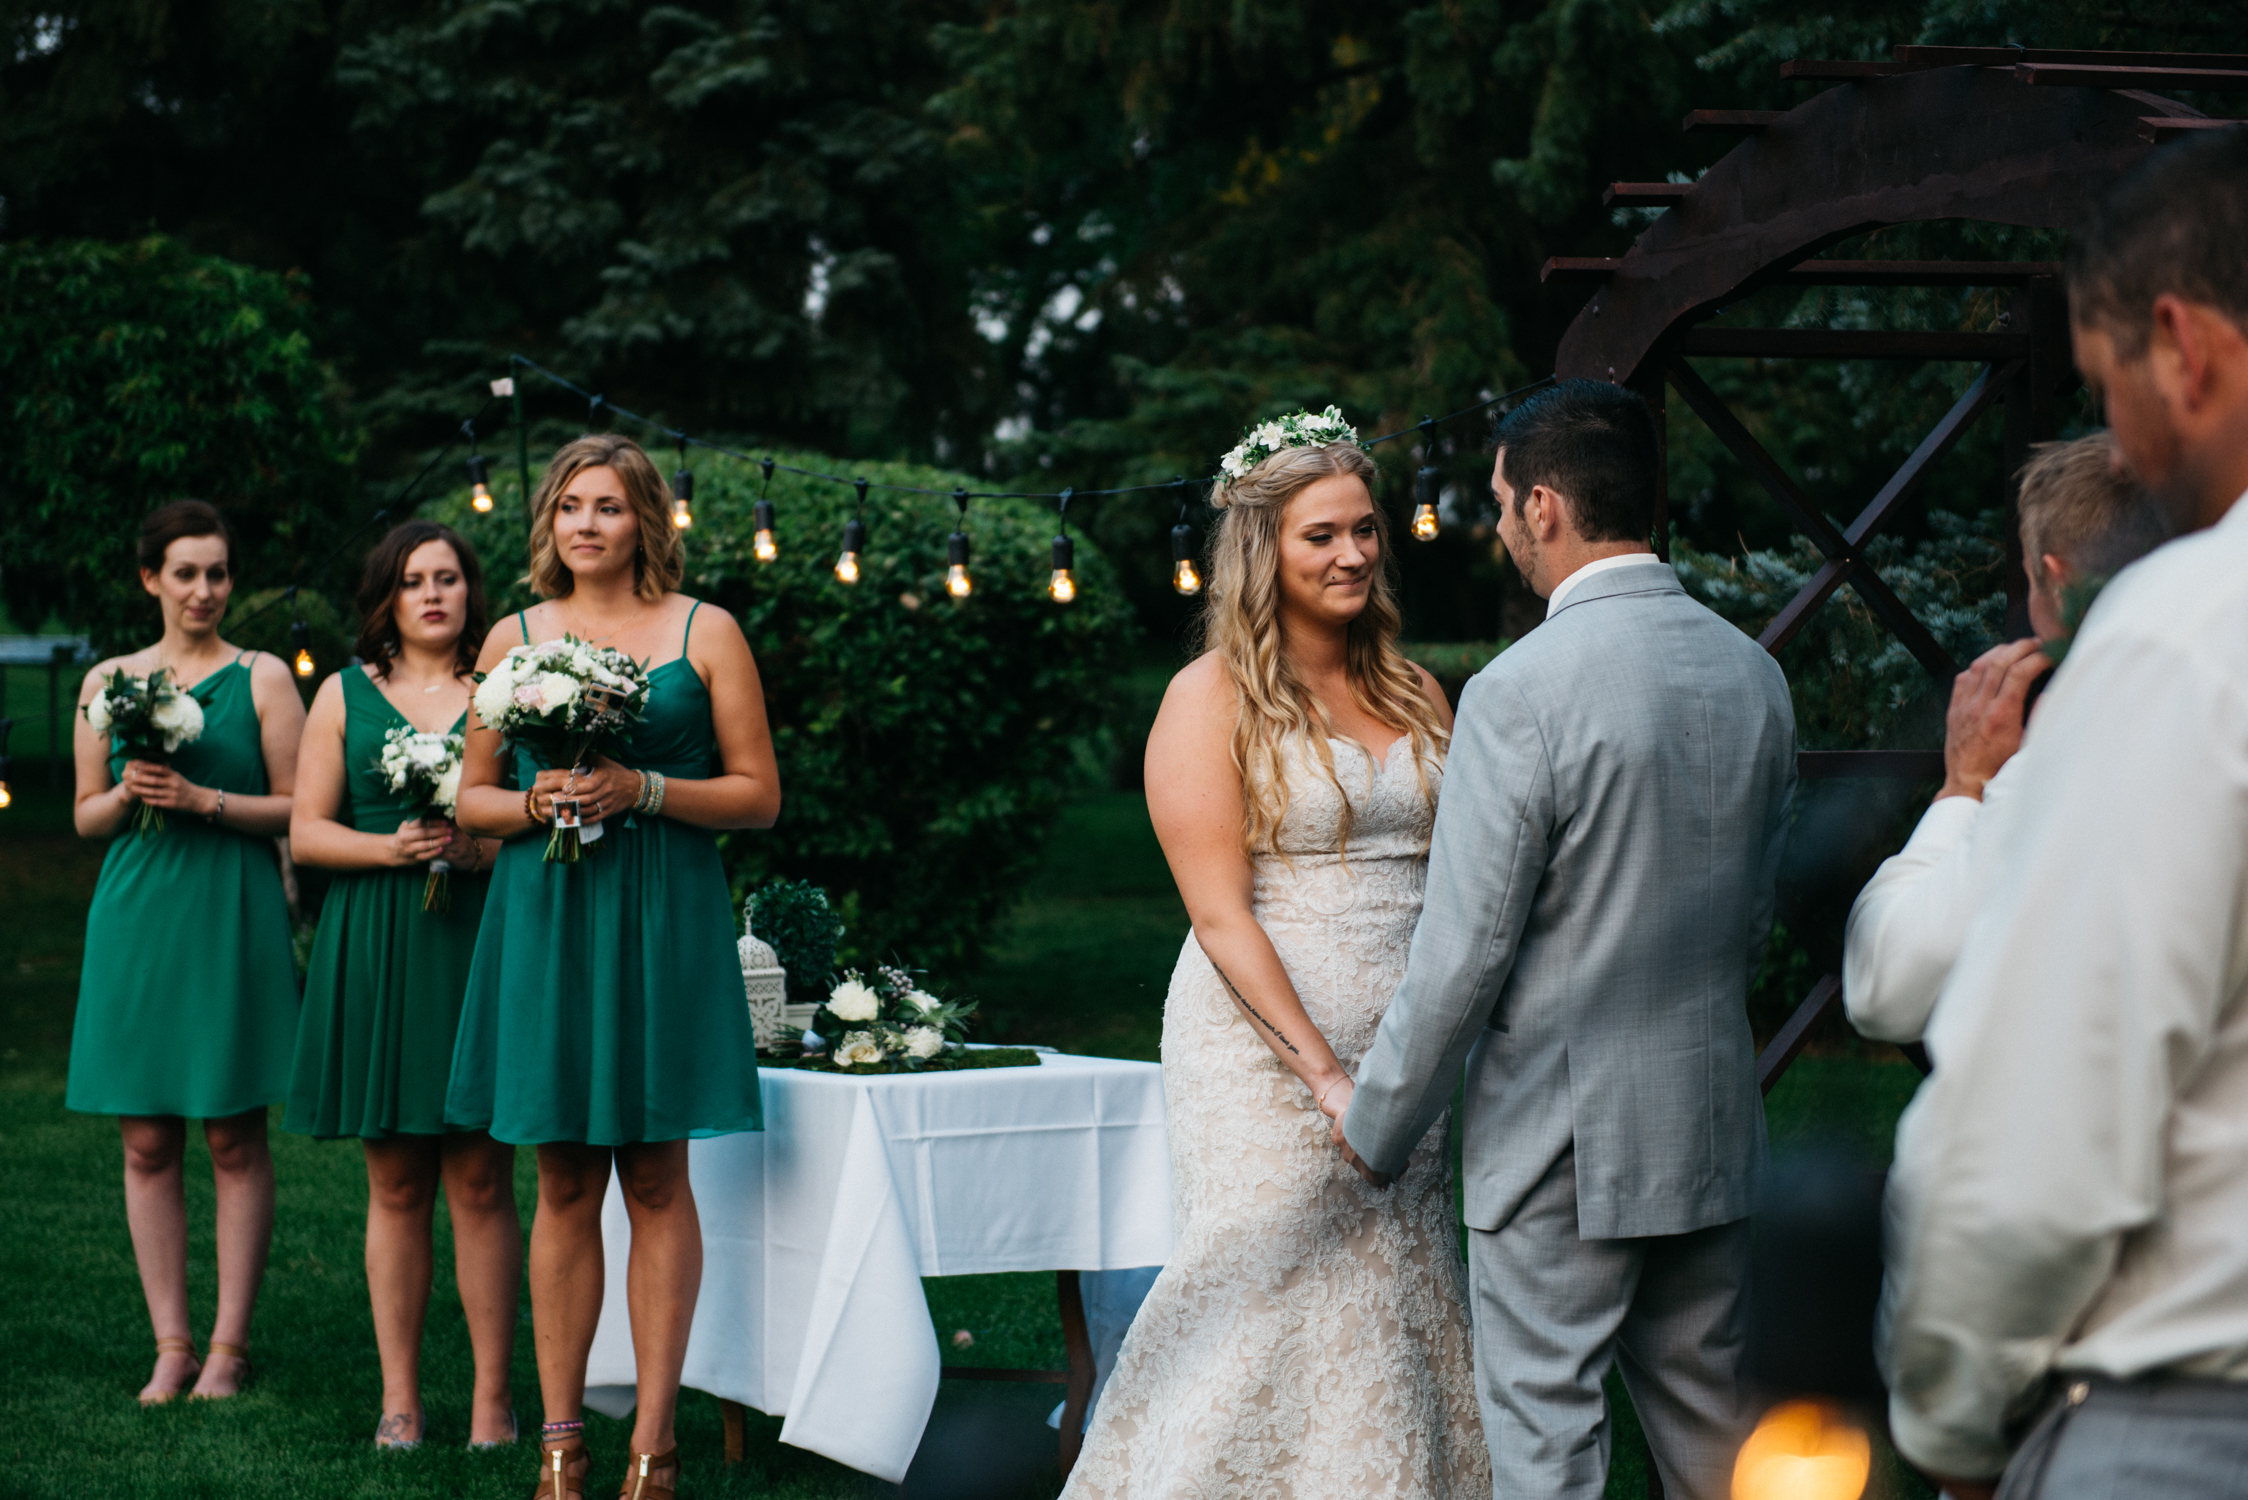 057_saskatoon_saskatchewan_small_town_wedding.jpg